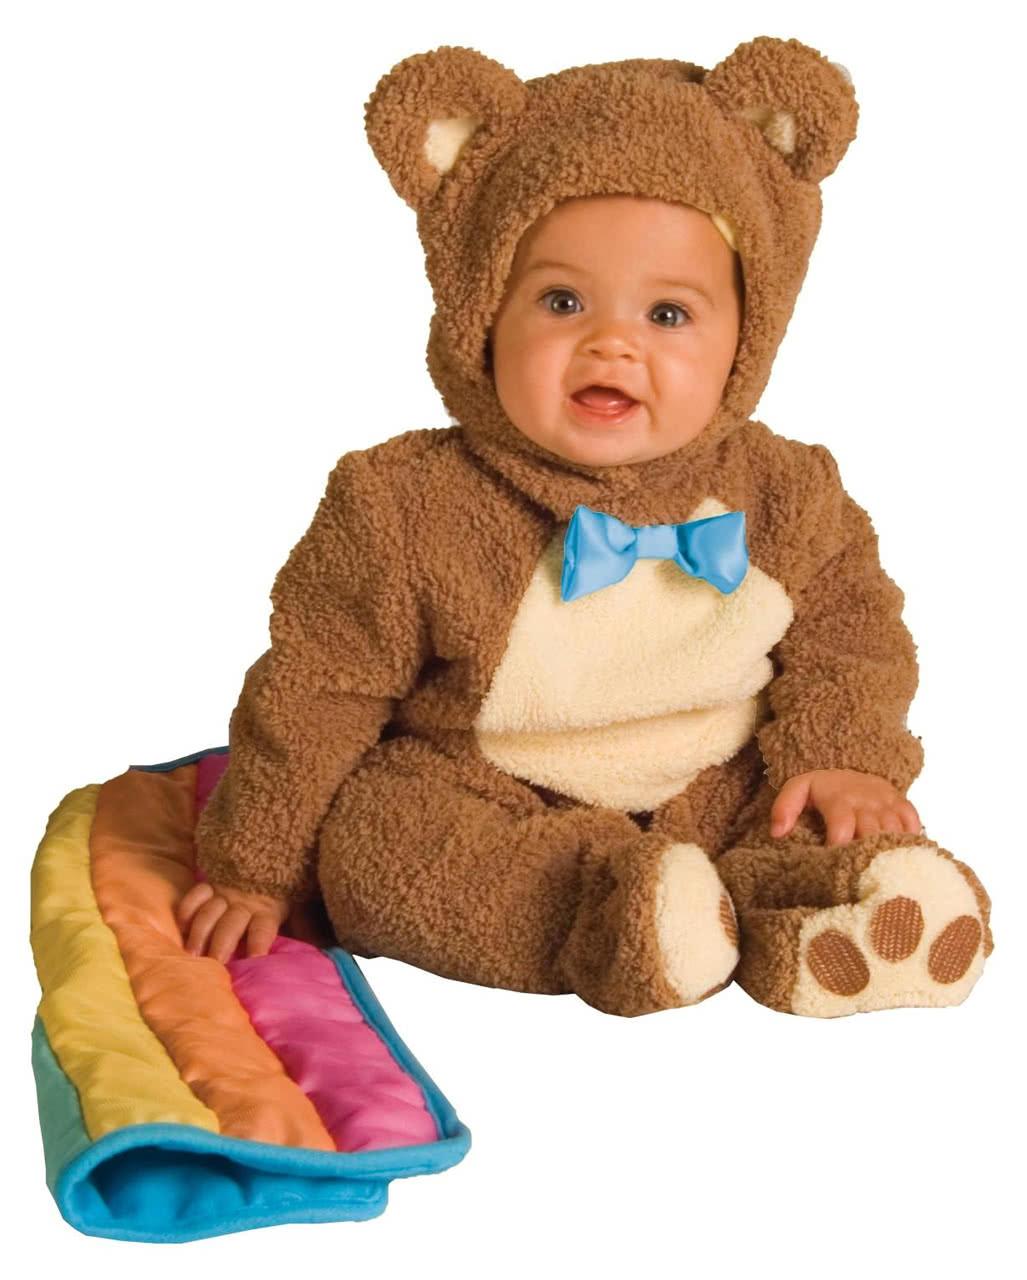 59dccc087c9ab Teddy Bear Baby Costume